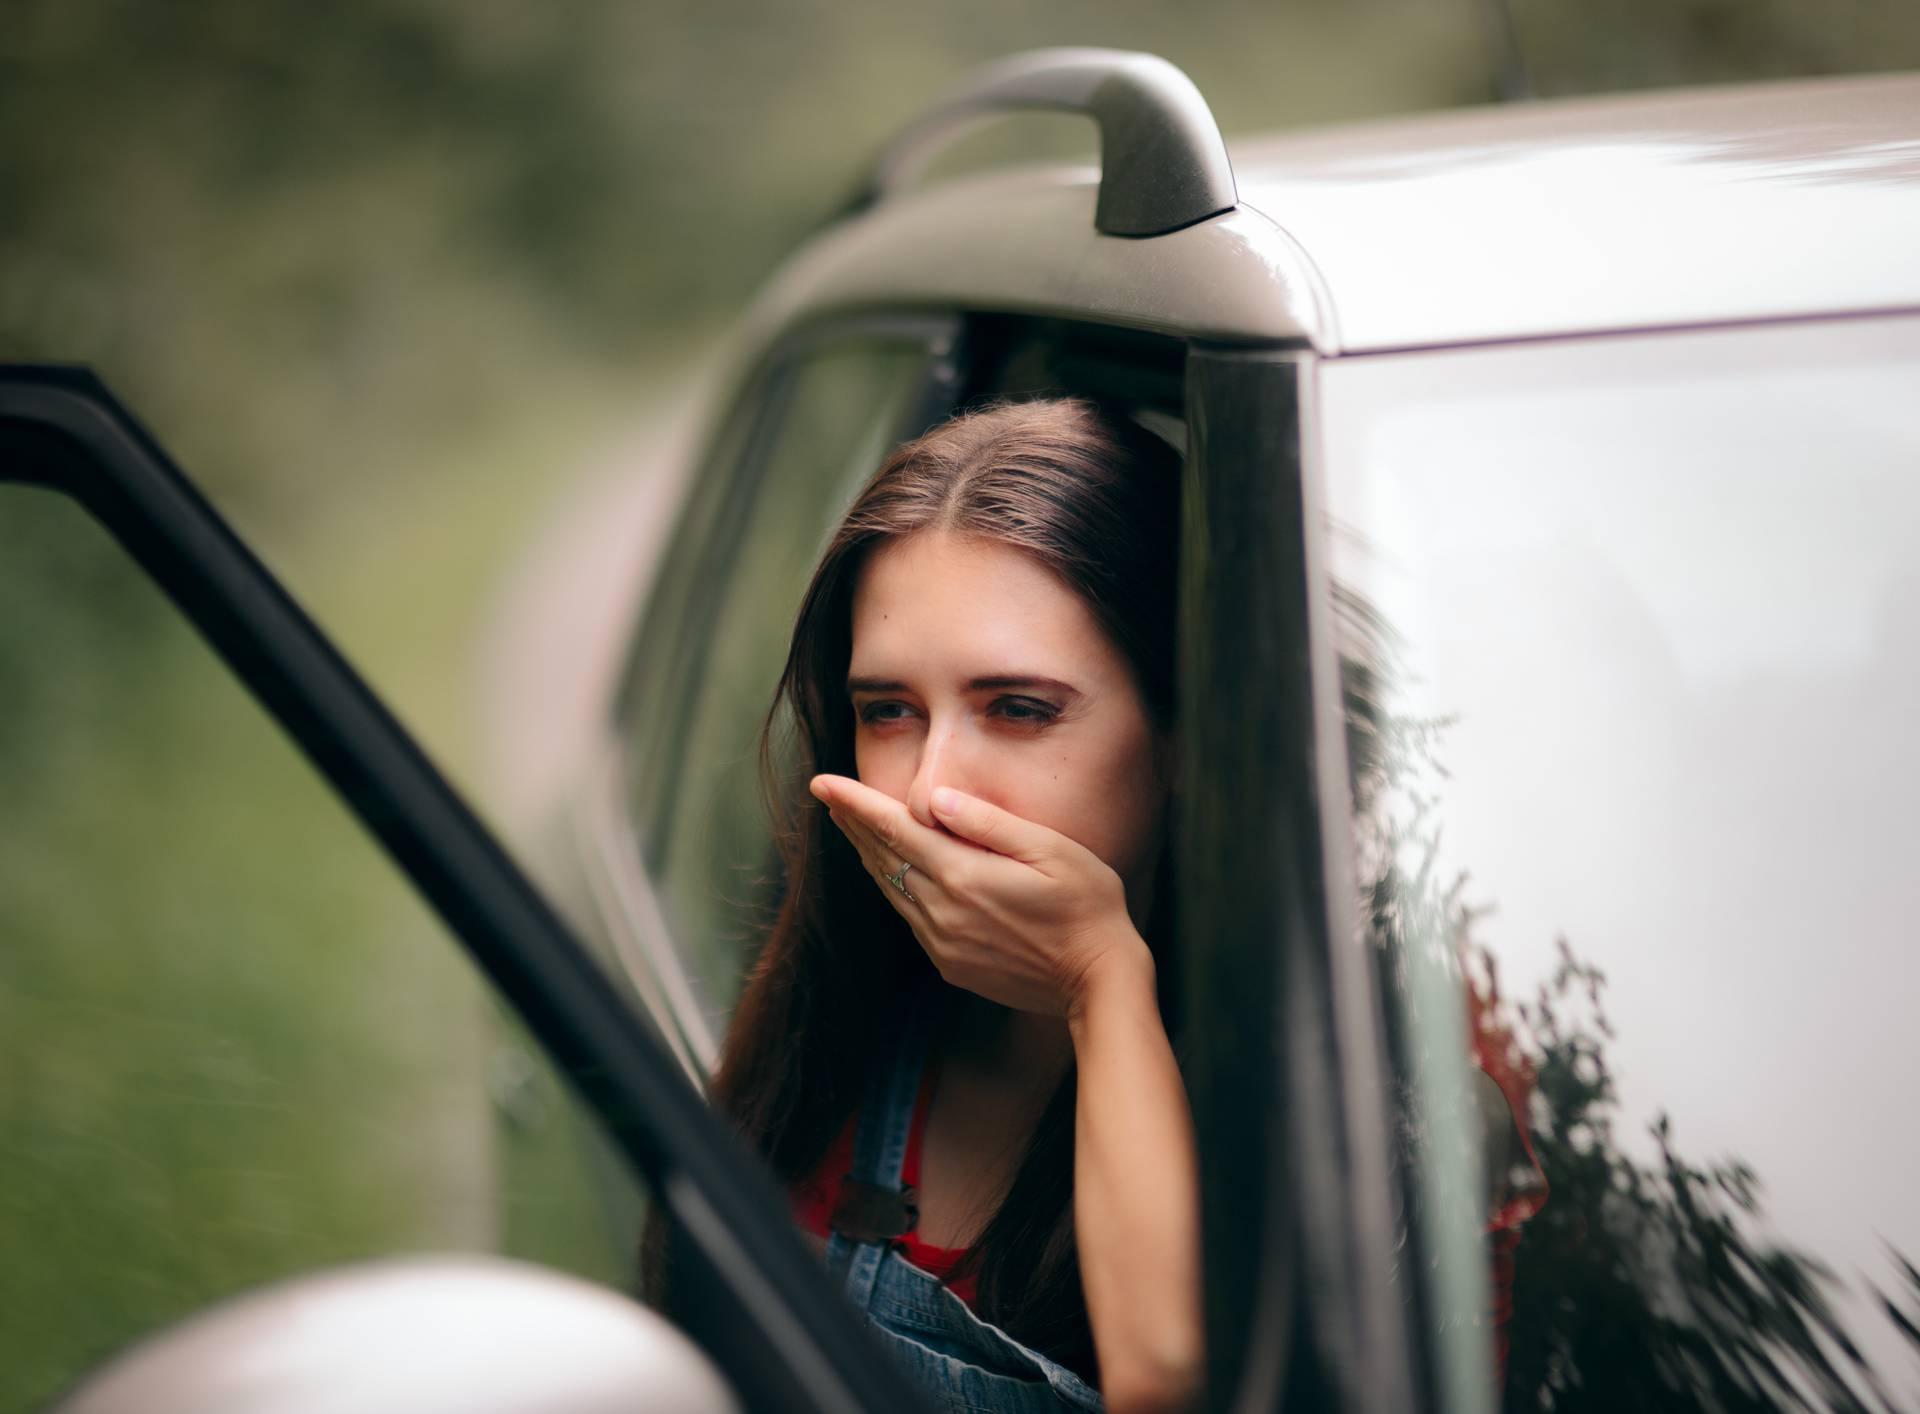 Car Sick Travel Woman with Motion Sickness Symptoms